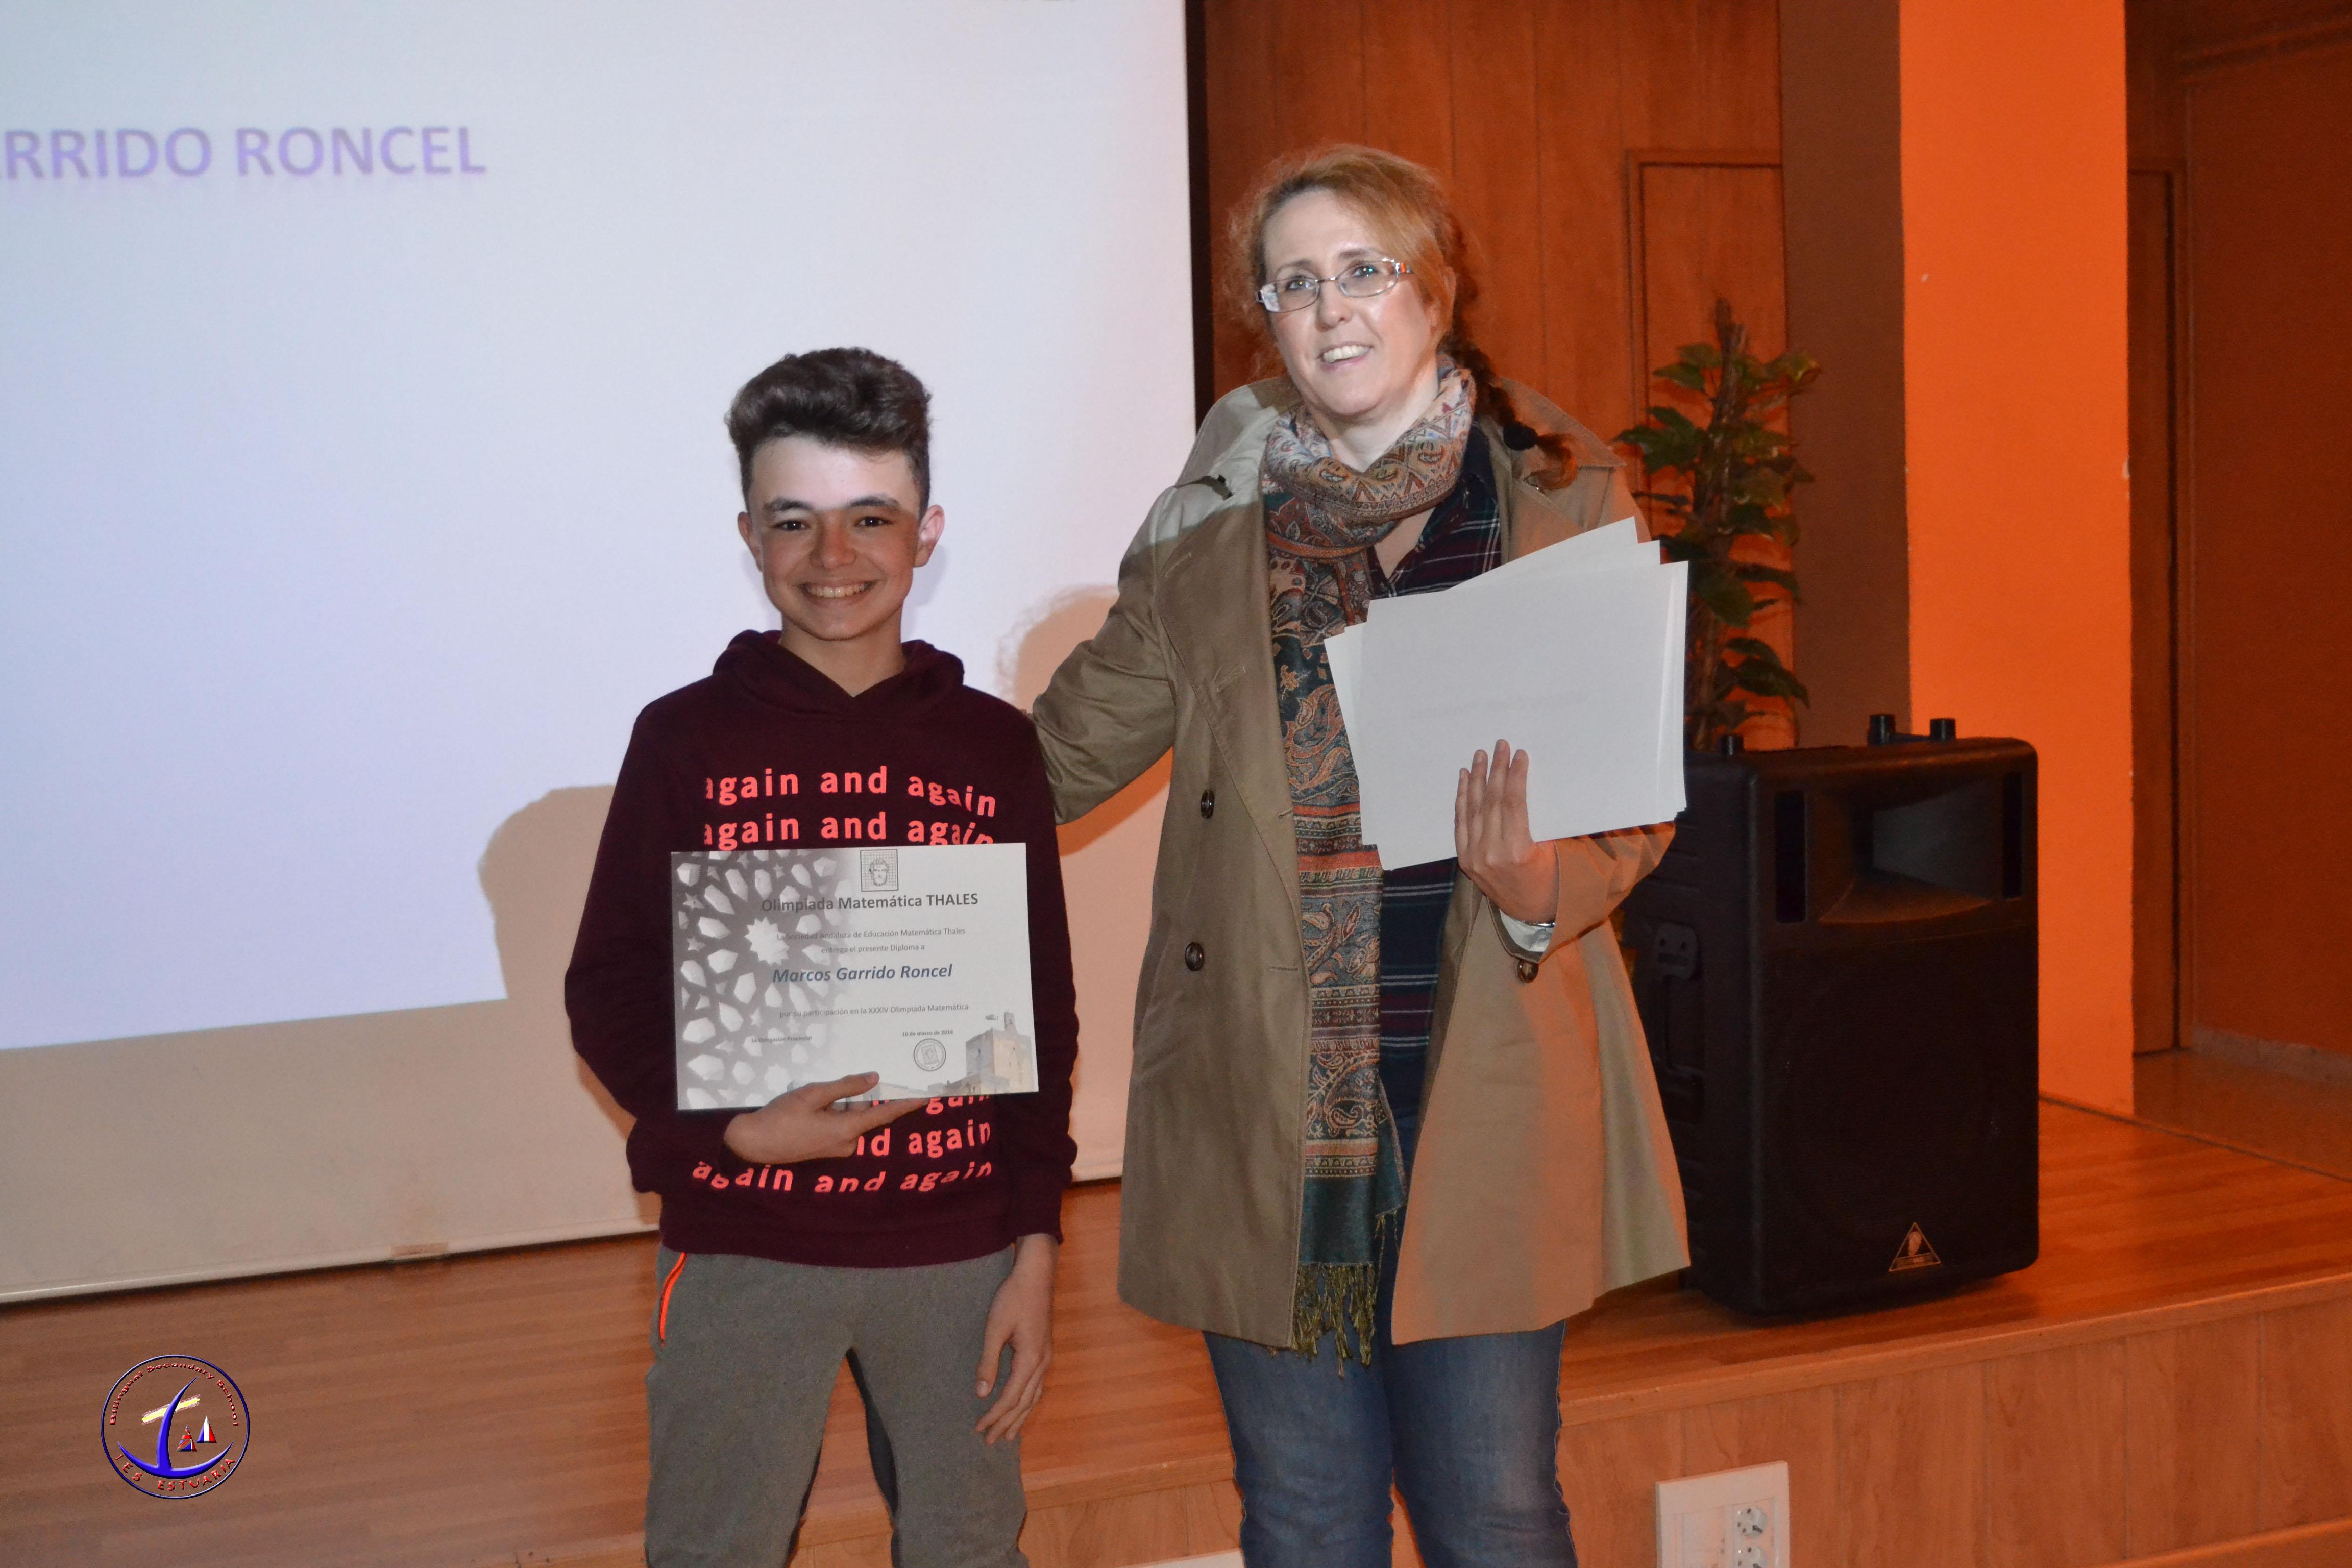 Entrega de diplomas de la XXXIV Olimpiadas Matemáticas